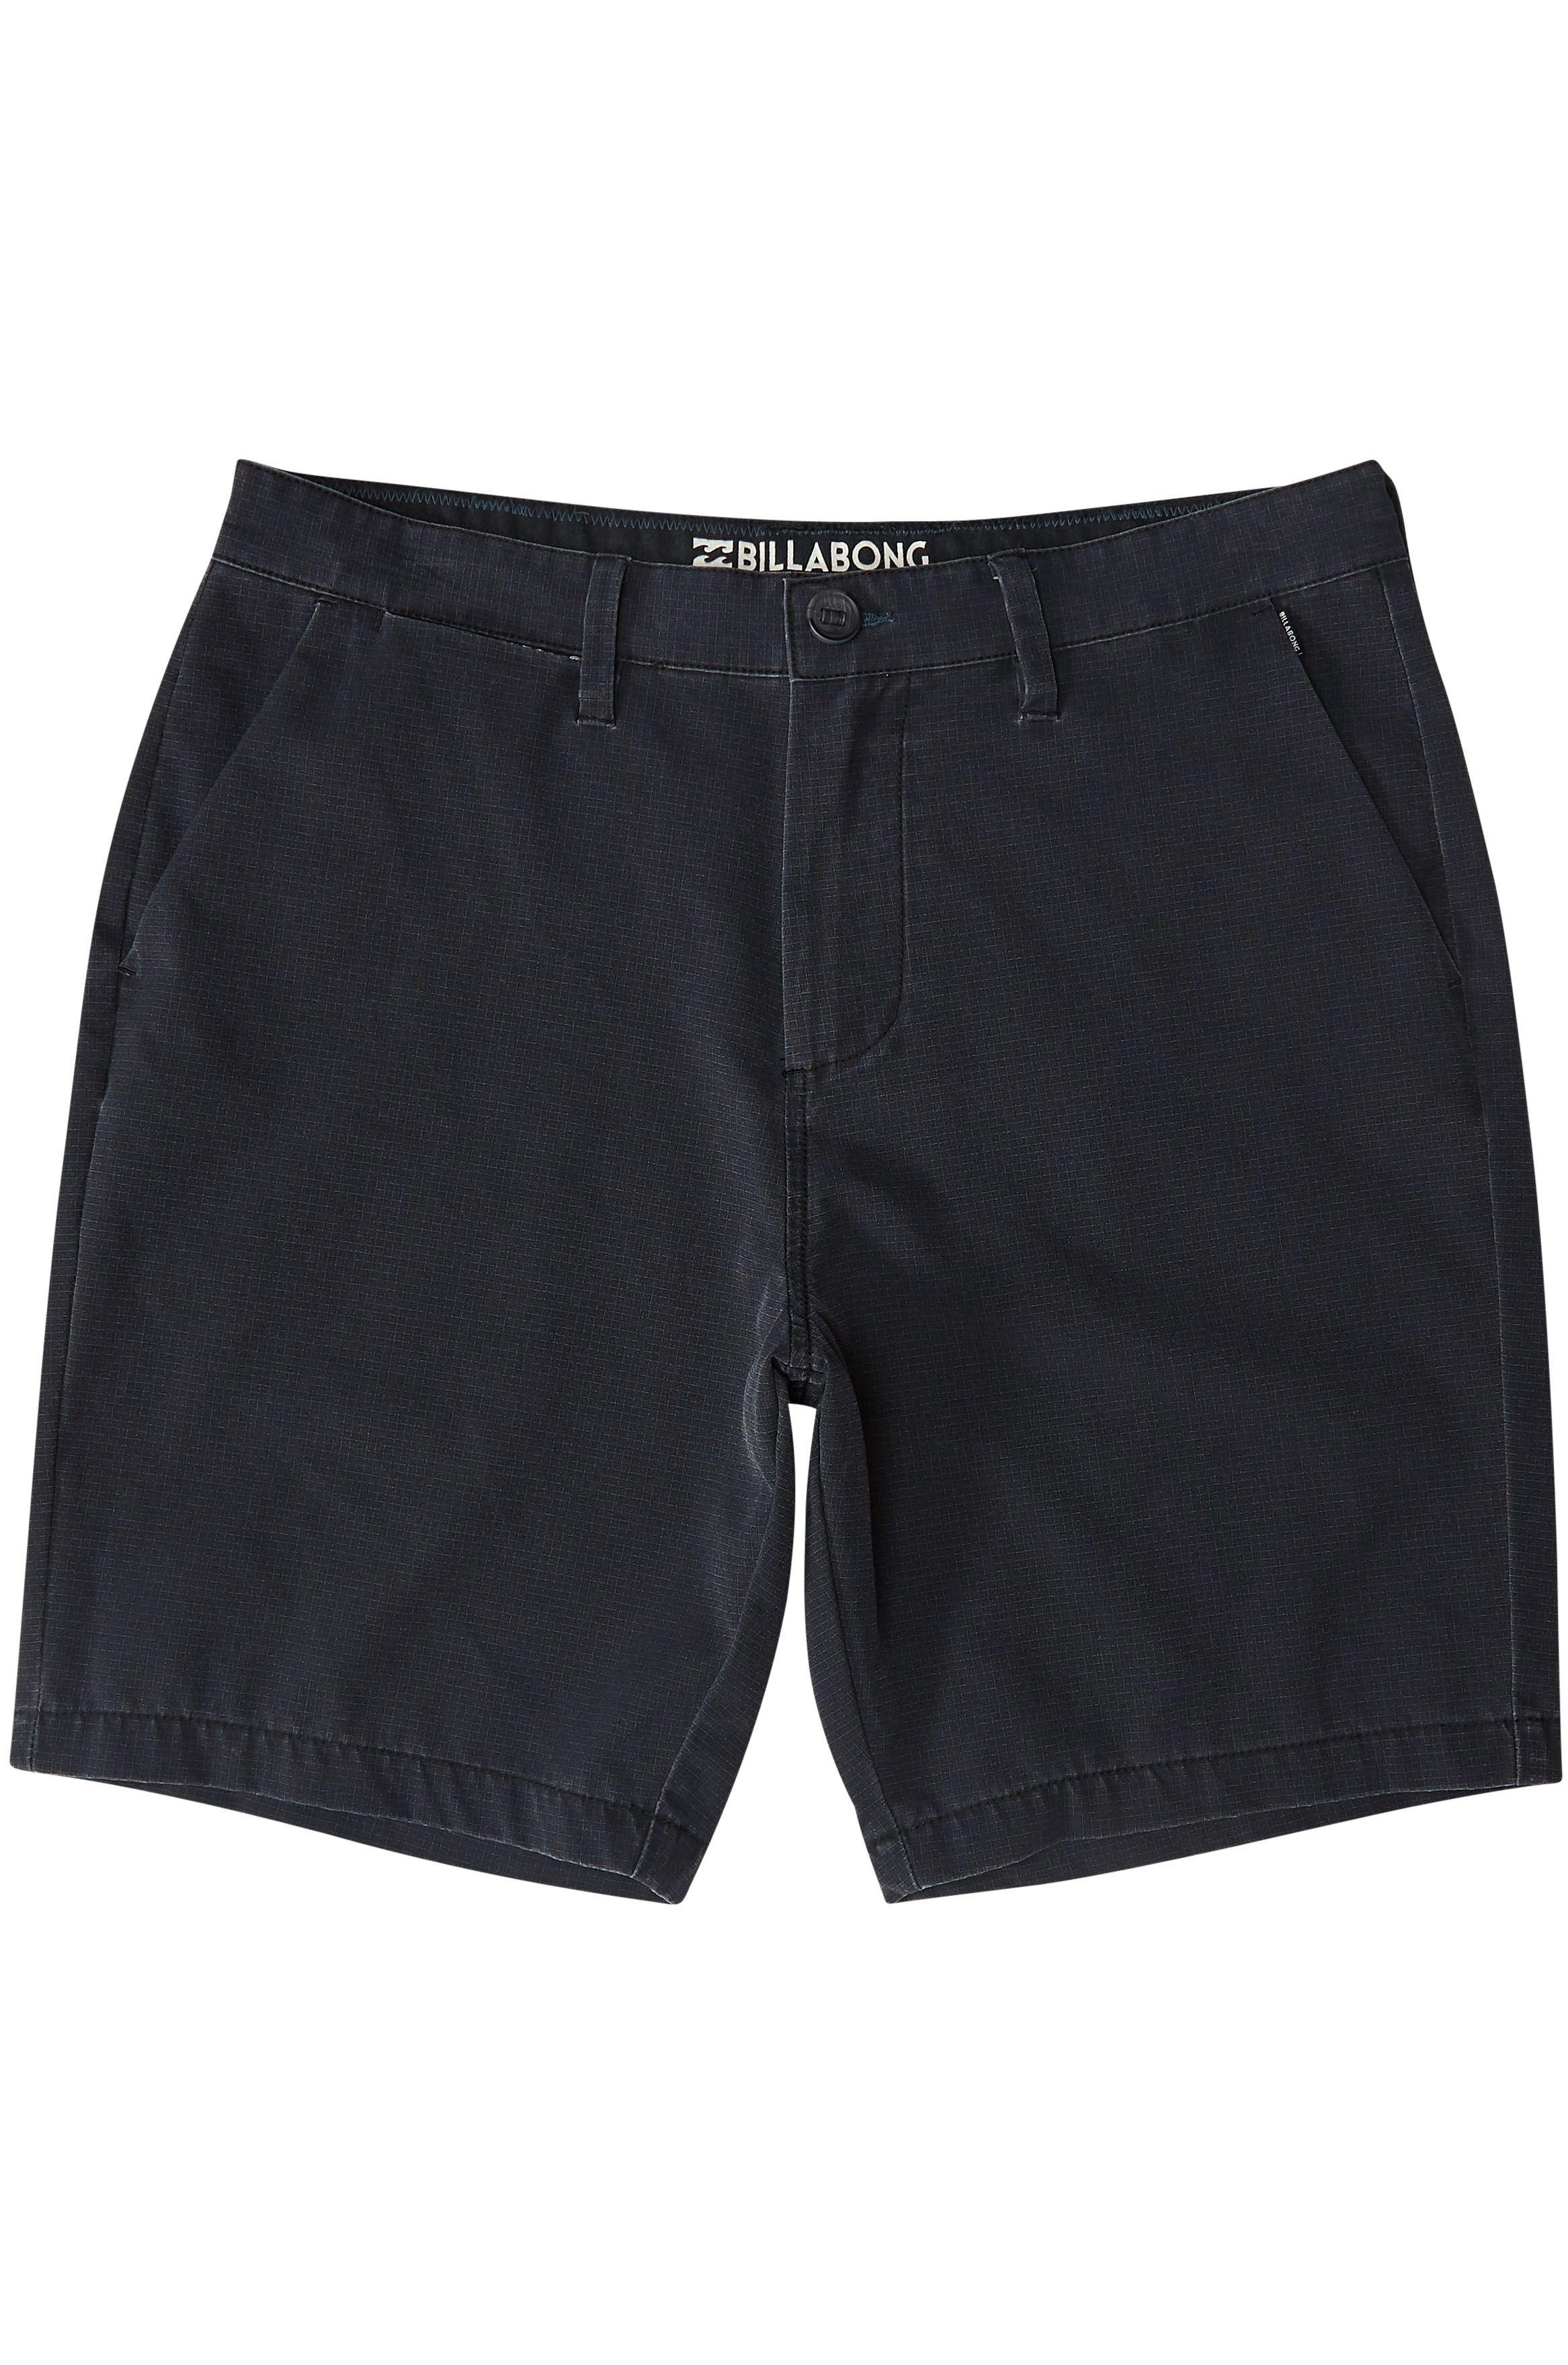 Billabong Walkshorts NEW ORDER X RIPSTOP Black